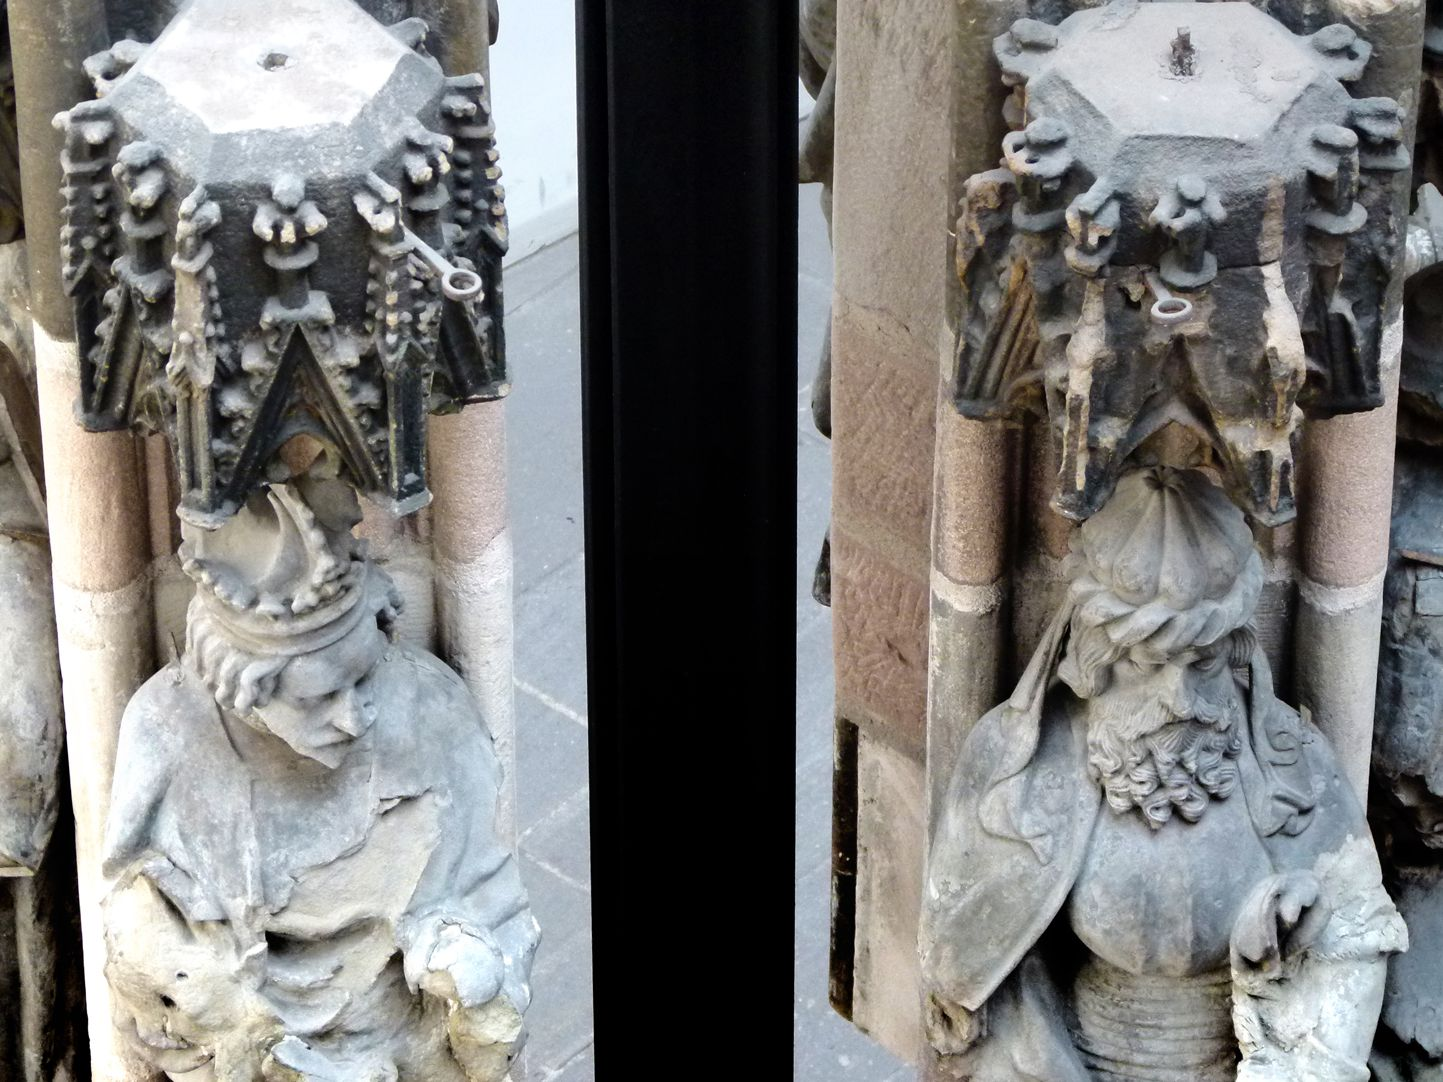 Schöner Brunnen Originalteile des Heldengeschosses mit Baldachinen